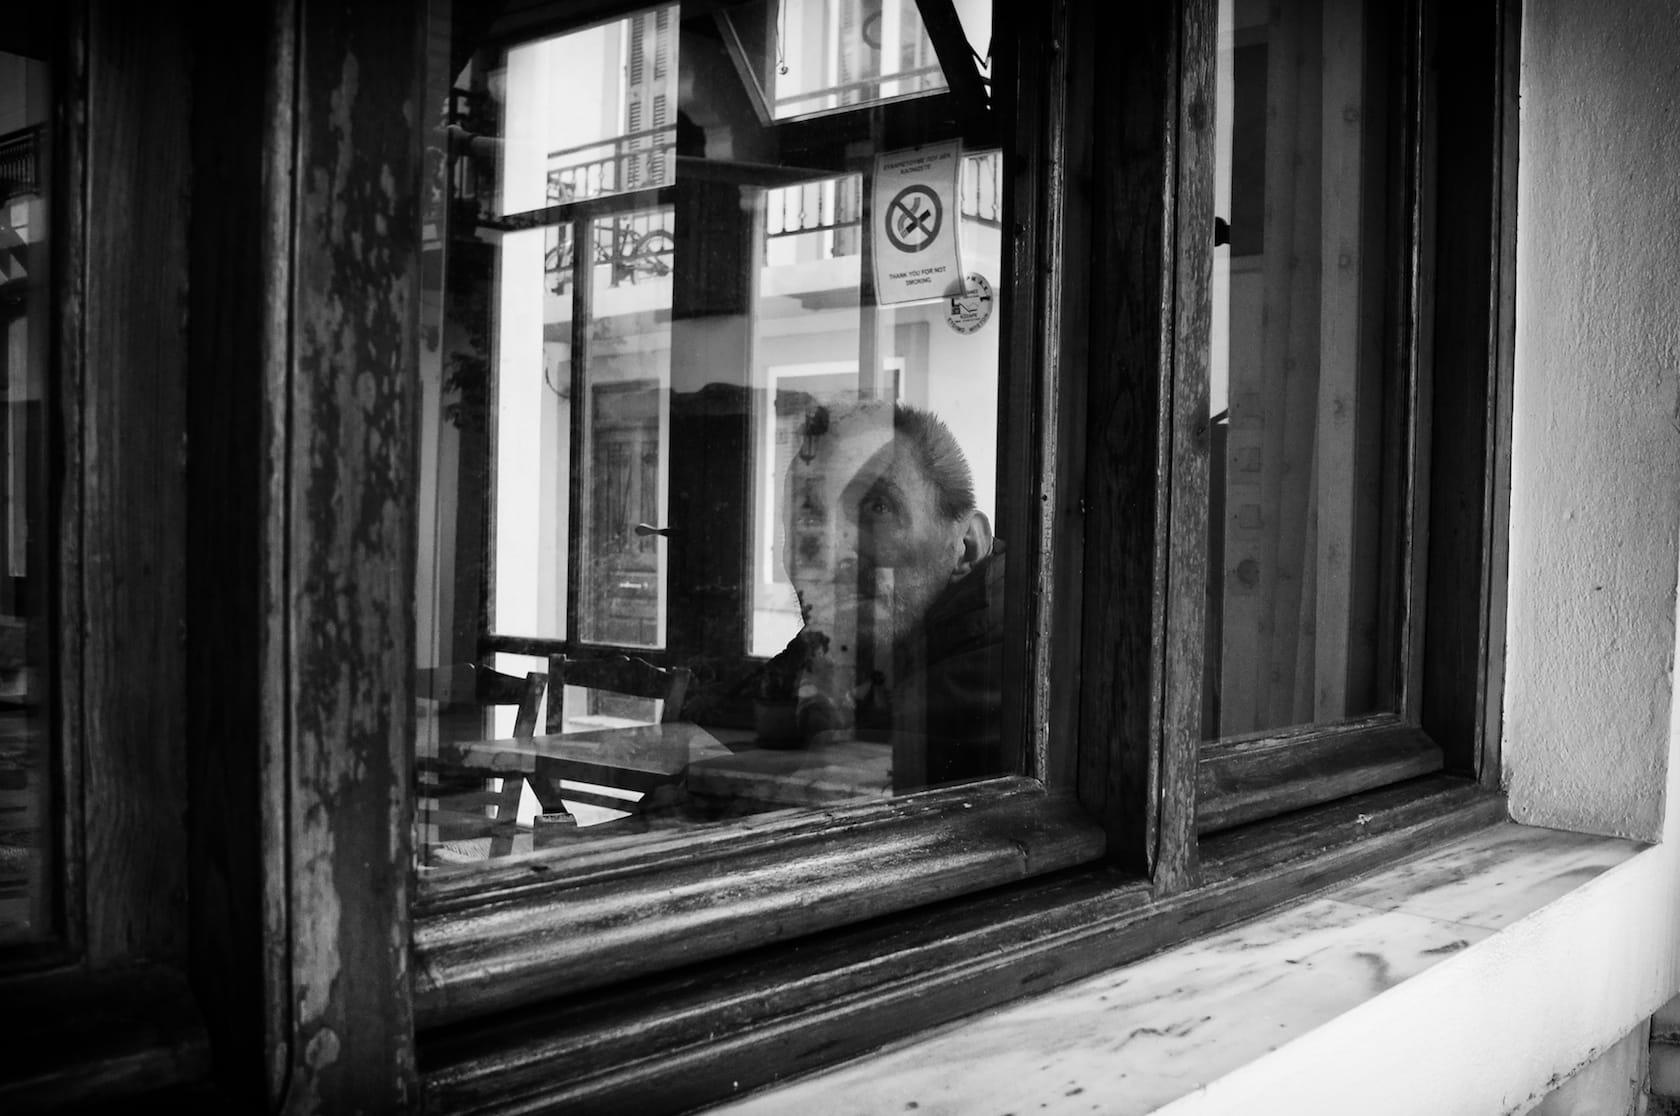 Through the coffee shop window